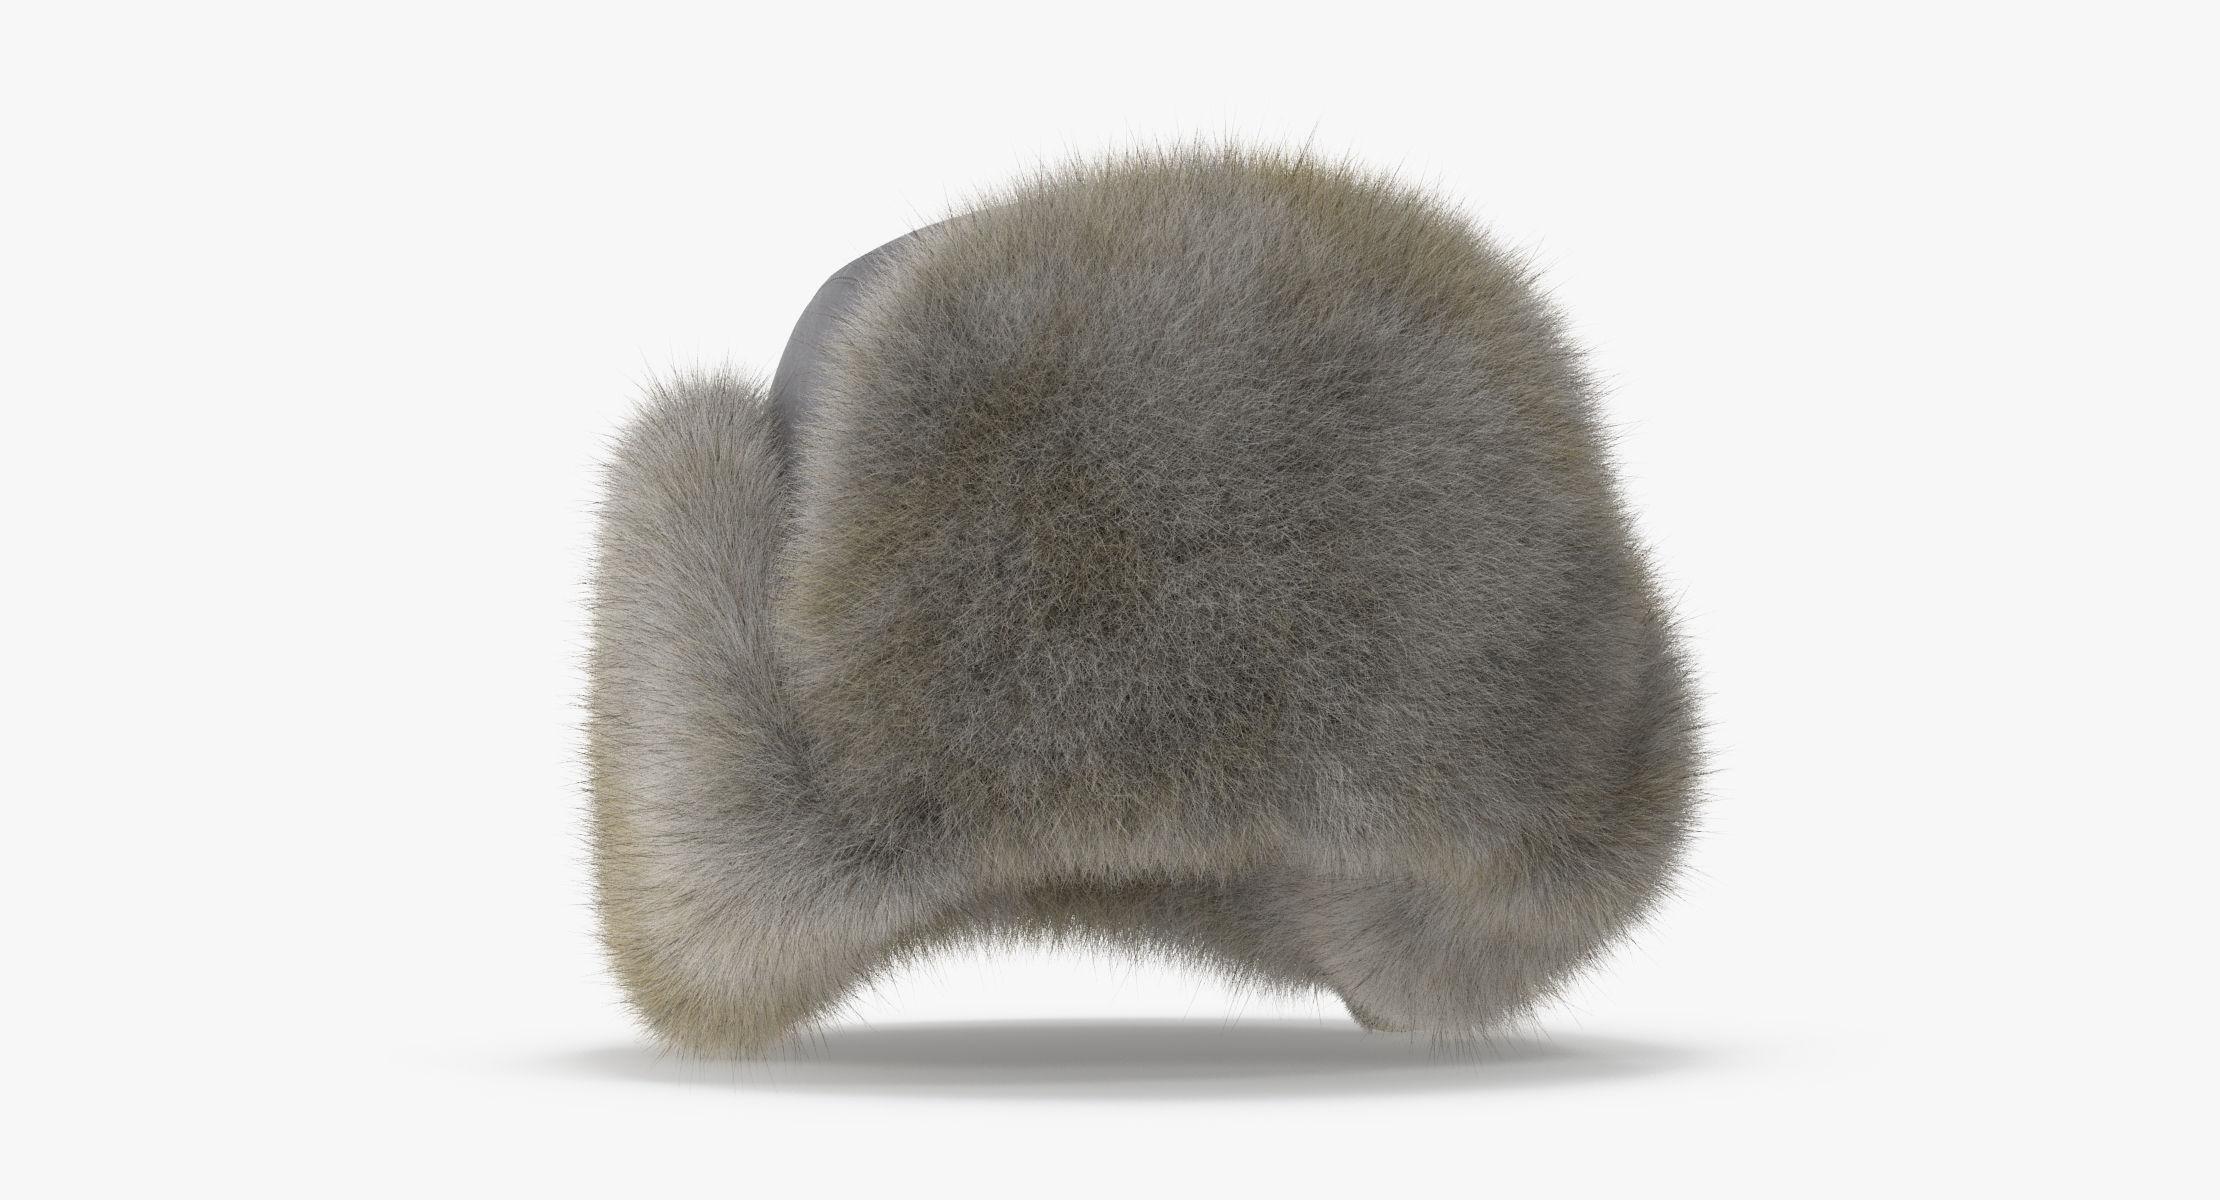 Winter Hat 03 Laying - reel 1